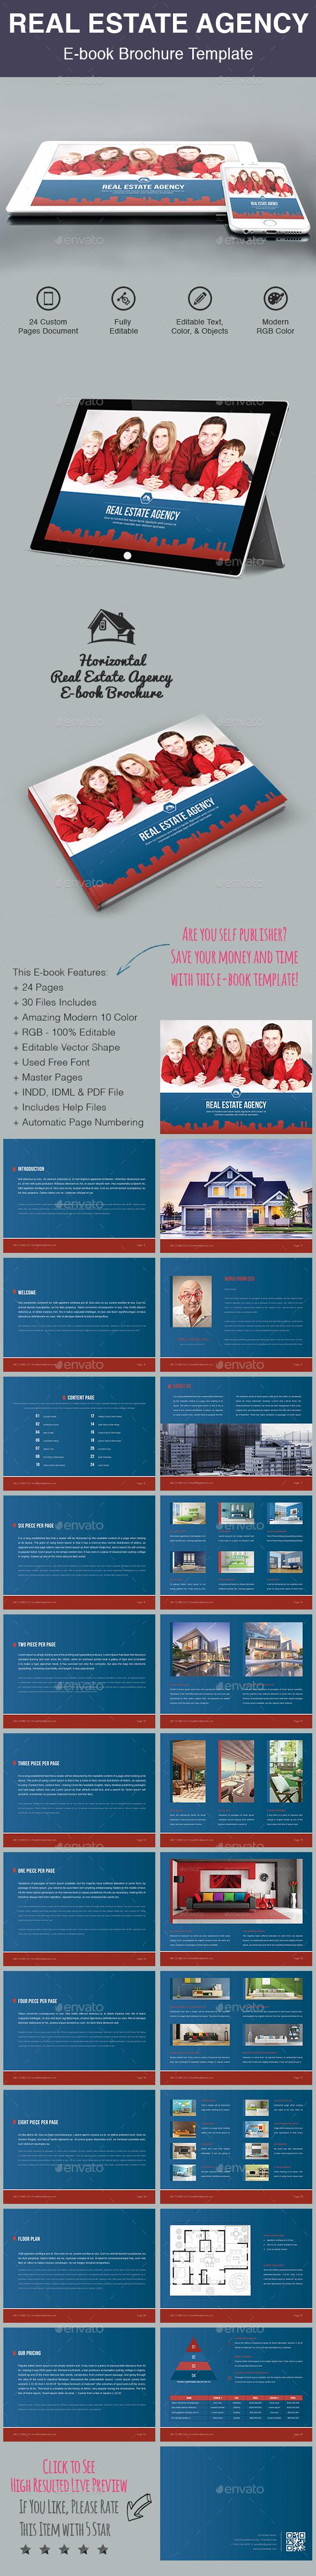 Real Estate Agency E-Book Brochure Template - Digital Books ePublishing